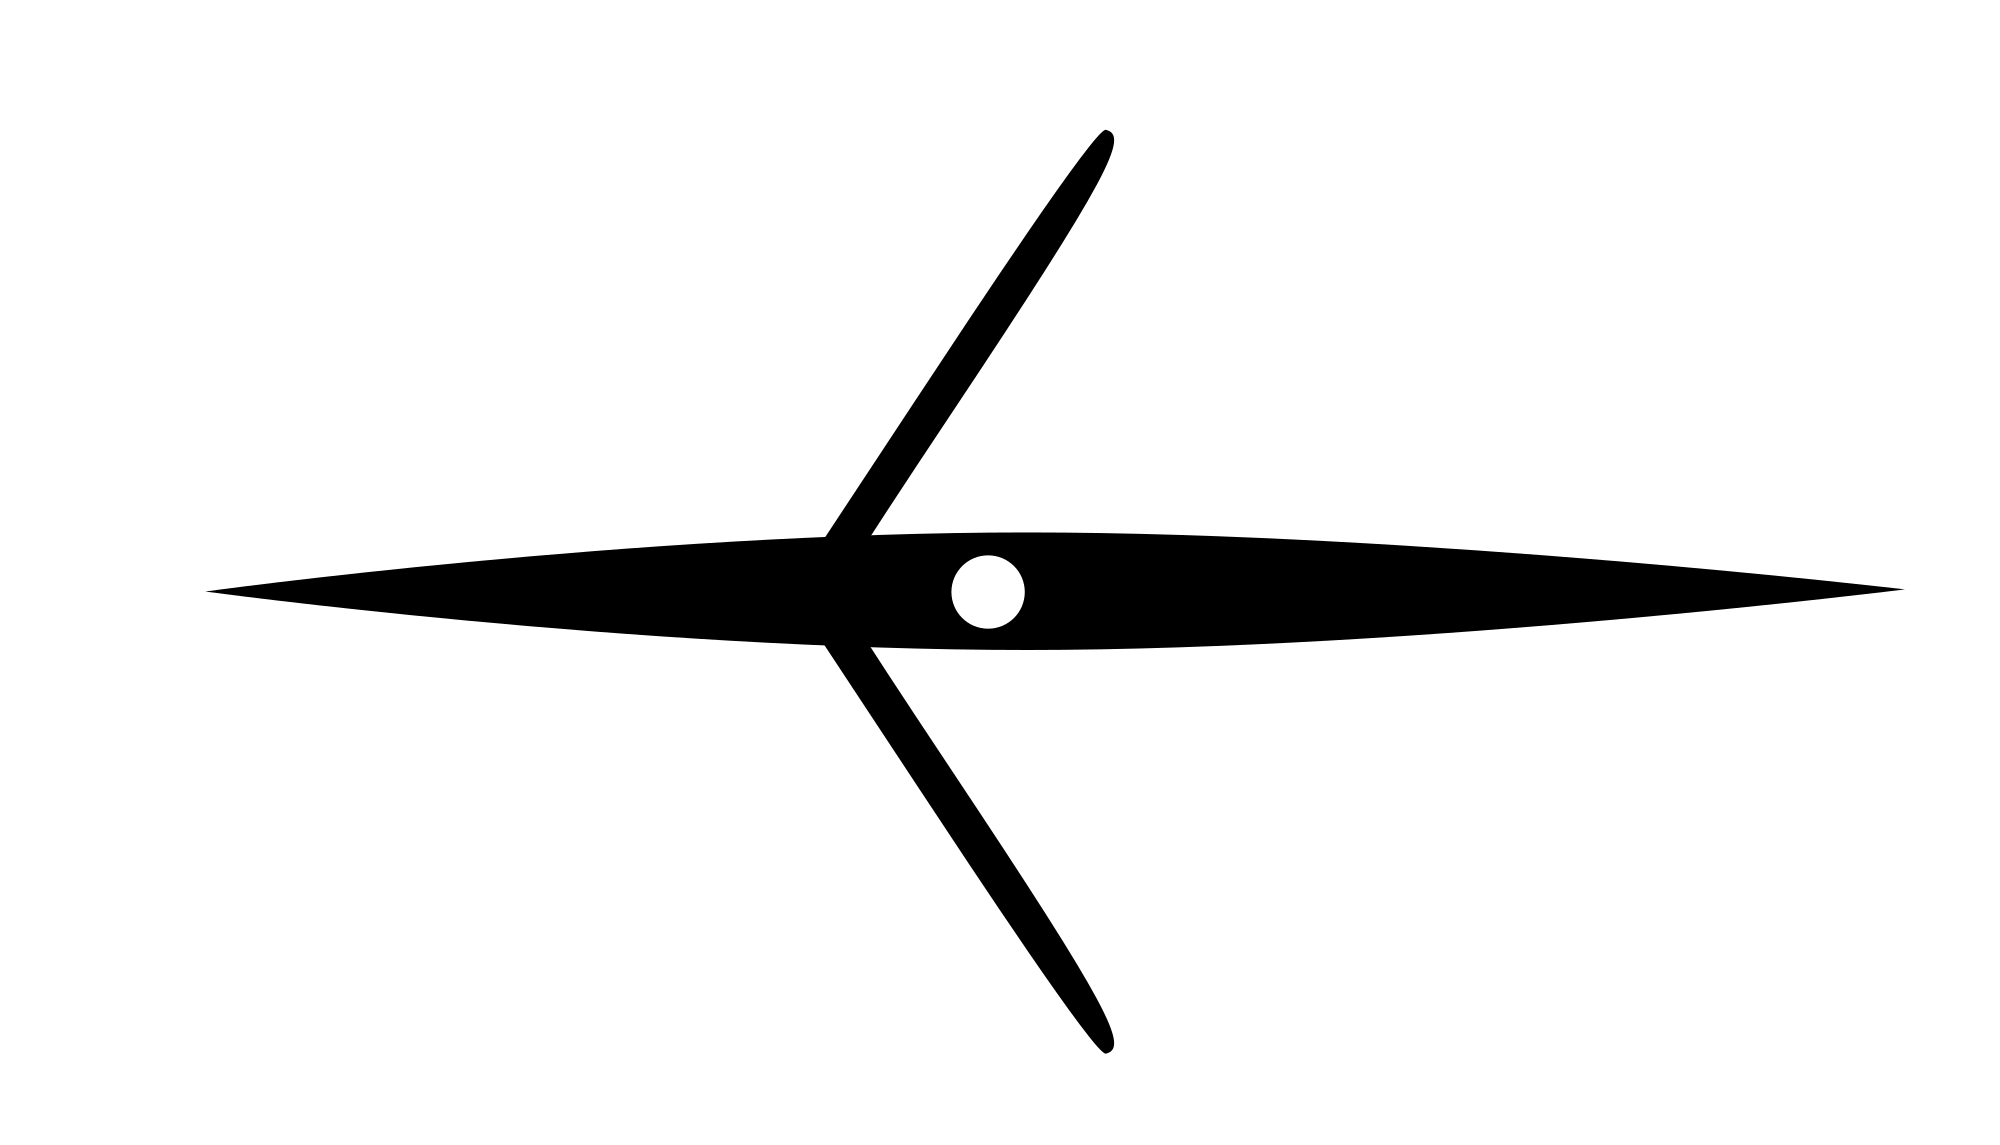 Rowing HD PNG - 119497